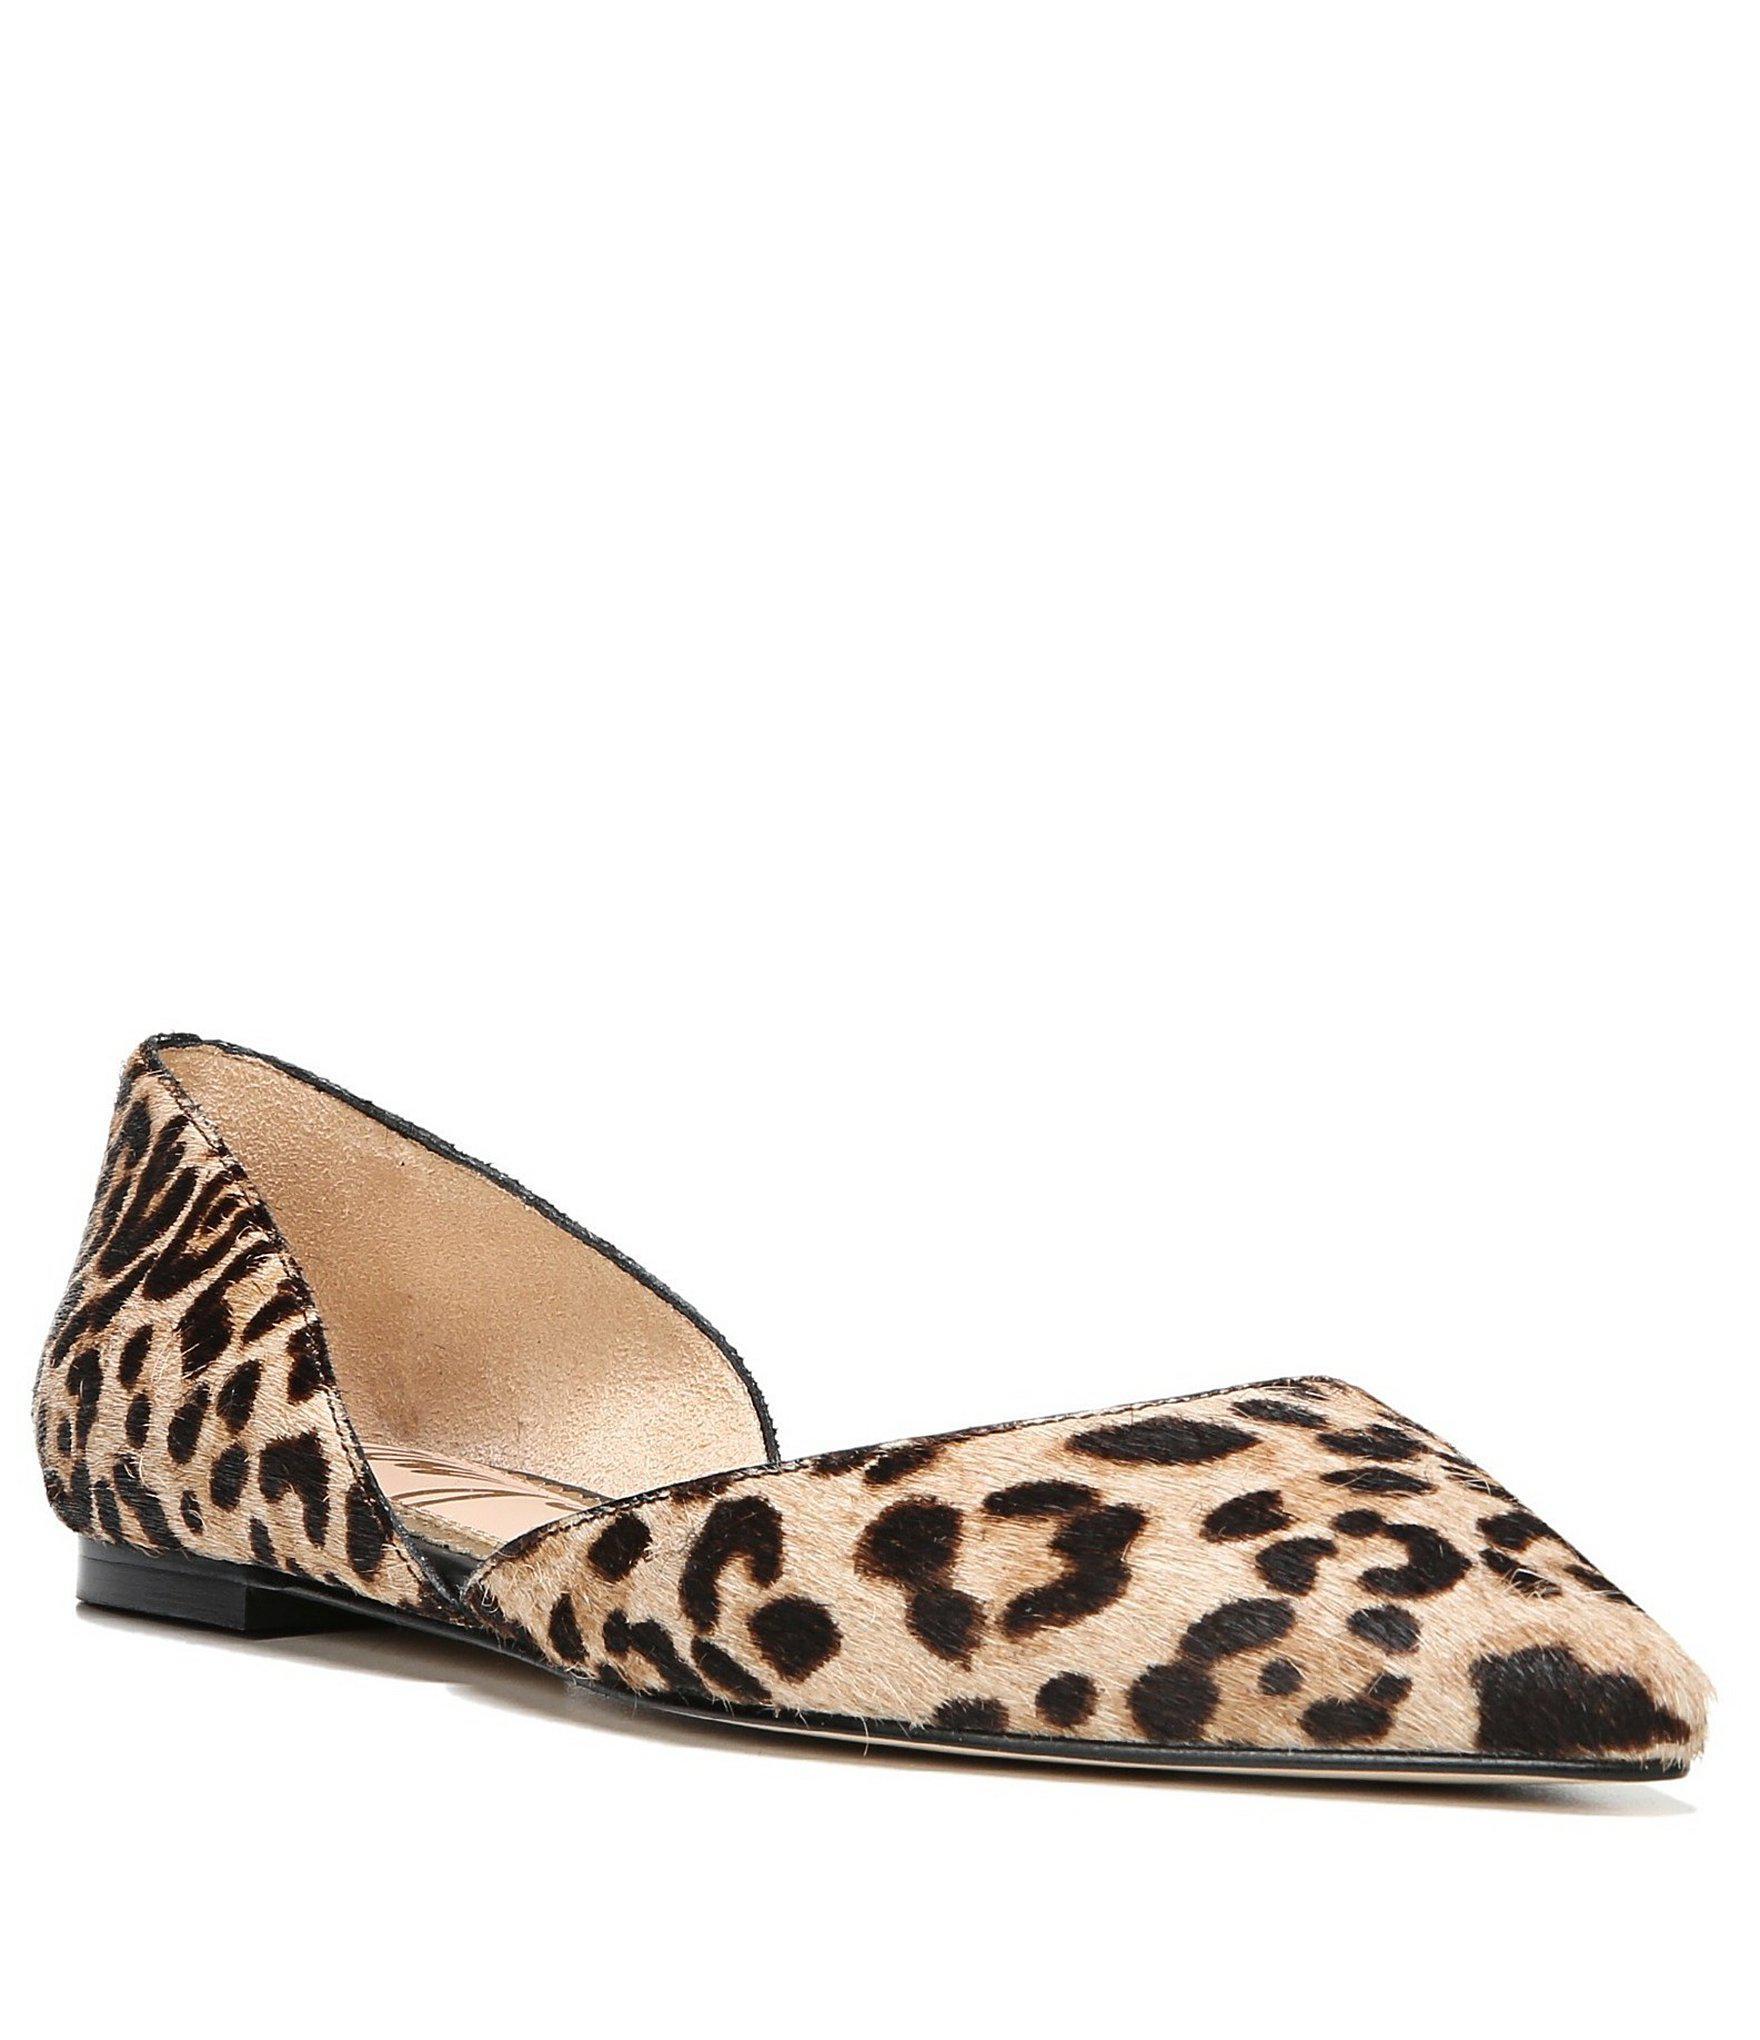 b4d6d6622173 Lyst - Sam Edelman Rodney Leopard Print Calf Hair D orsay Flats ...